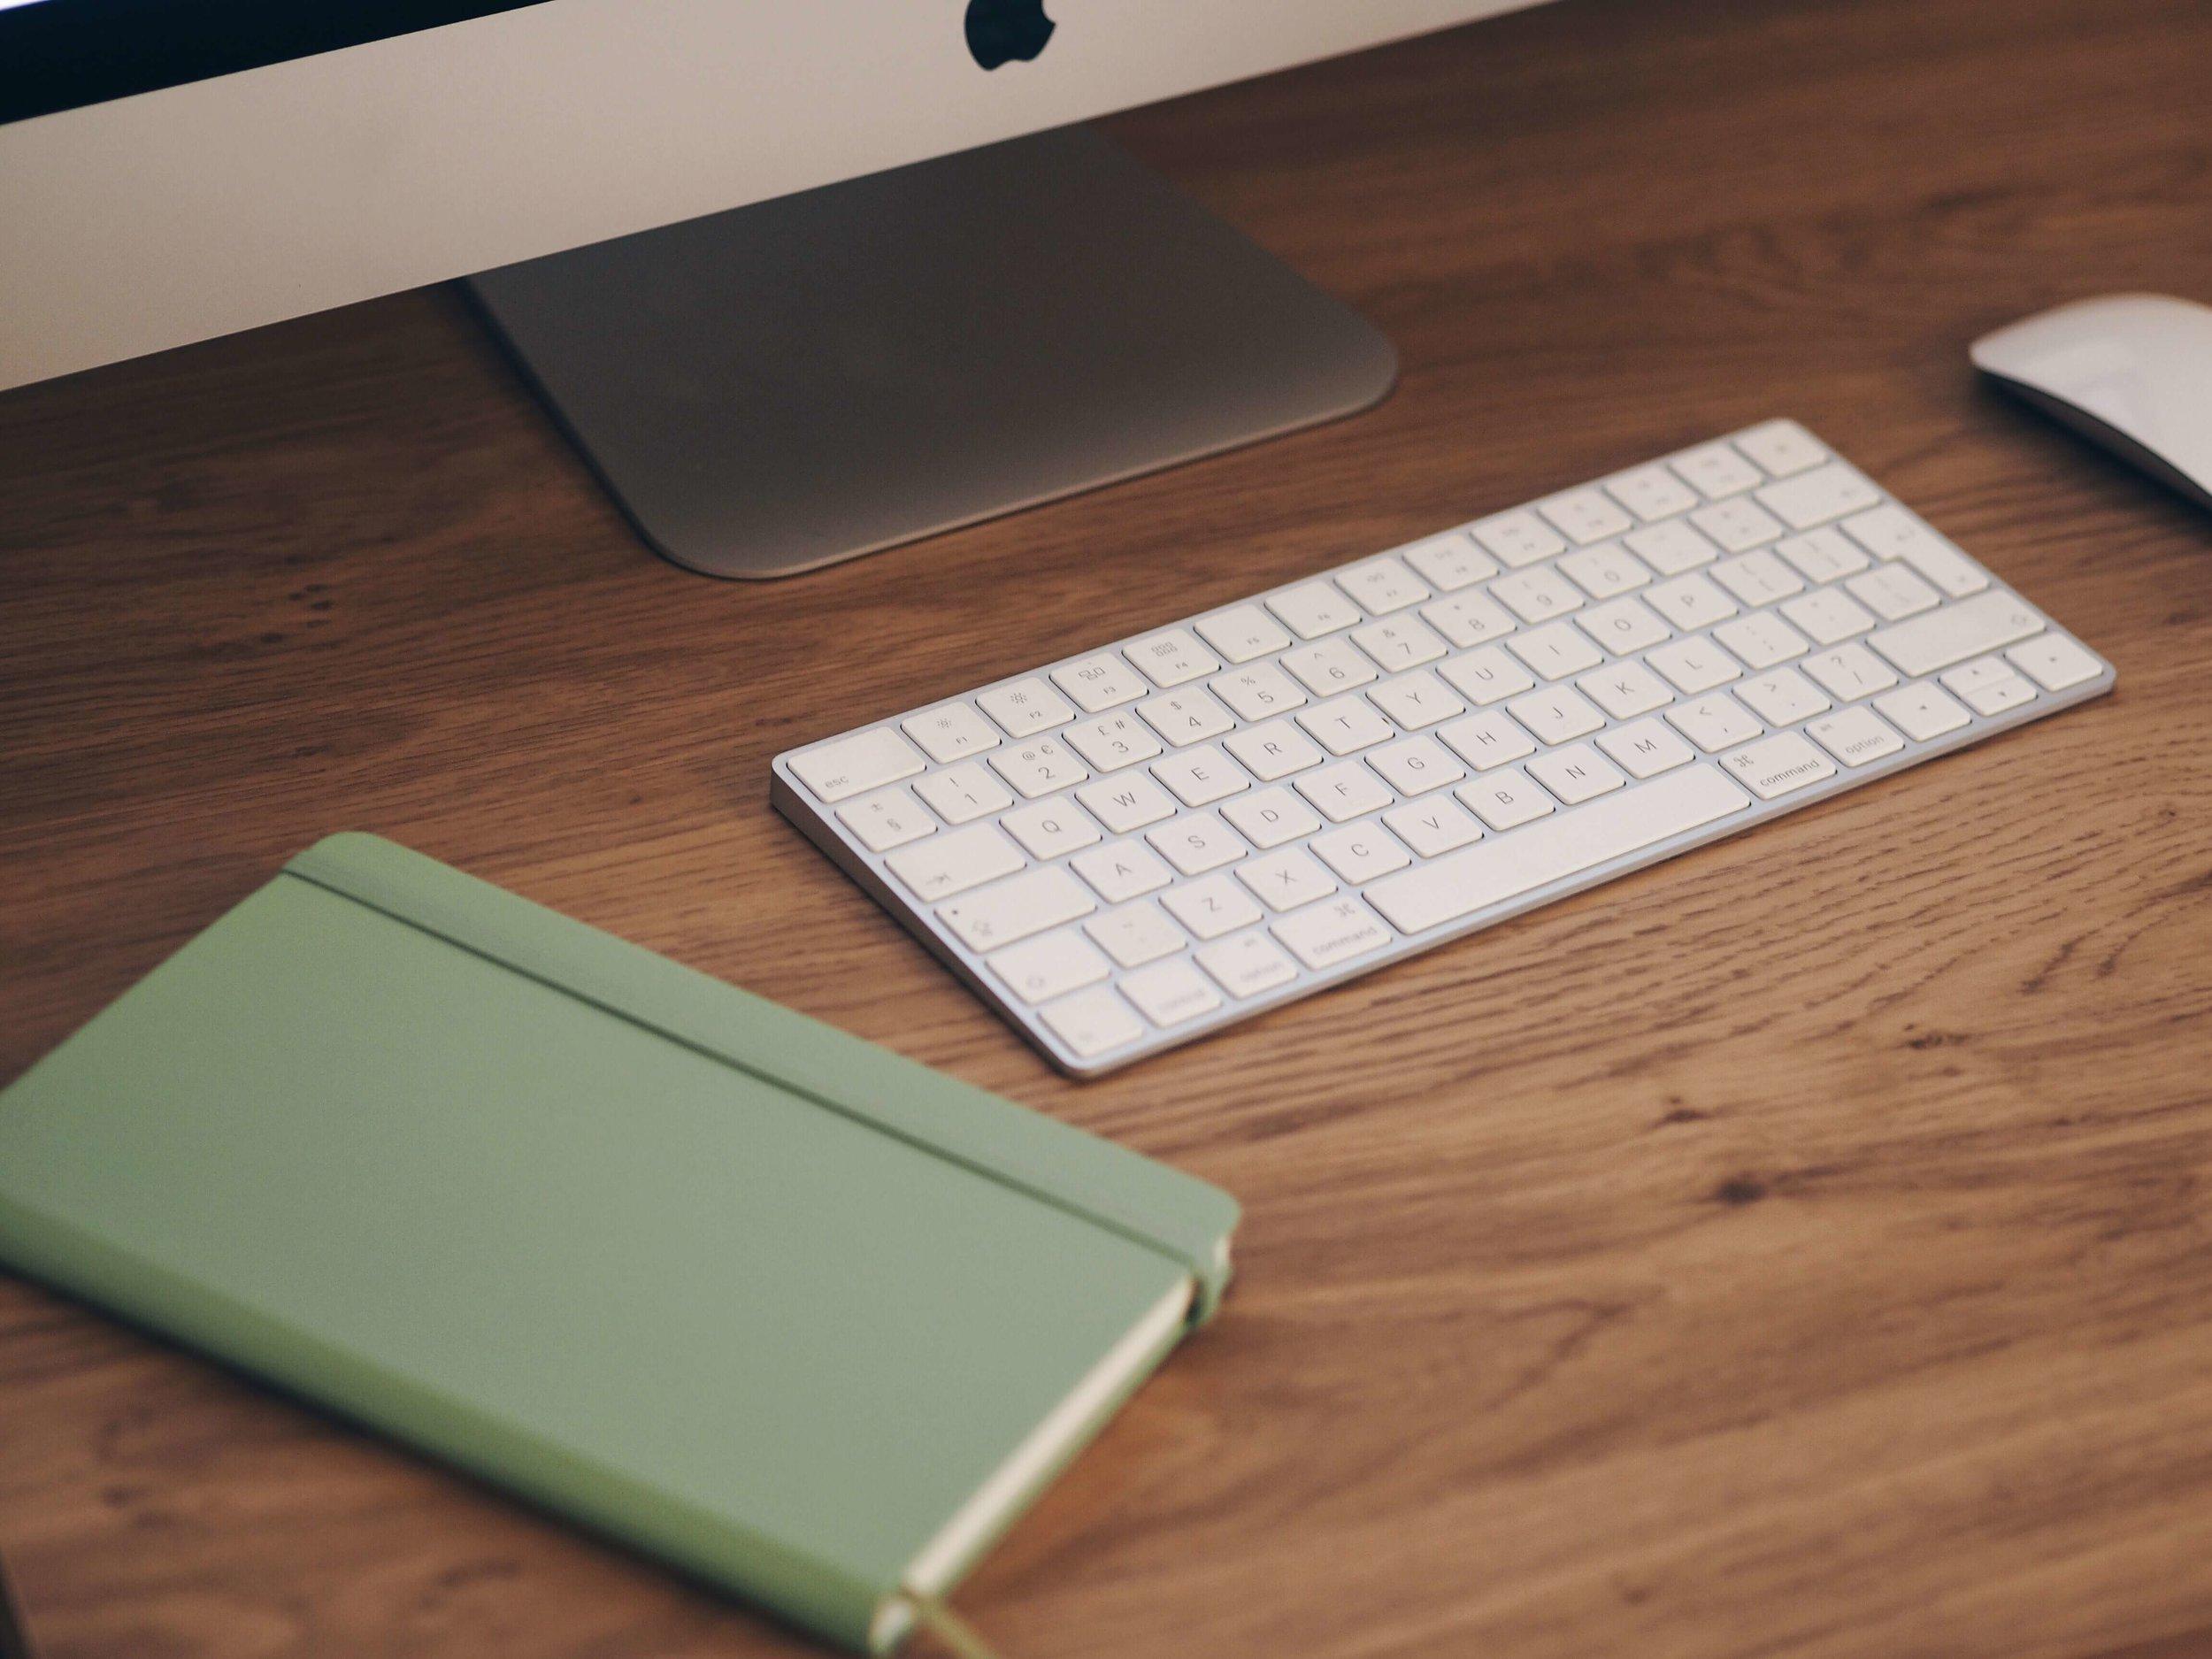 iMac Computer Minimal Desk Space